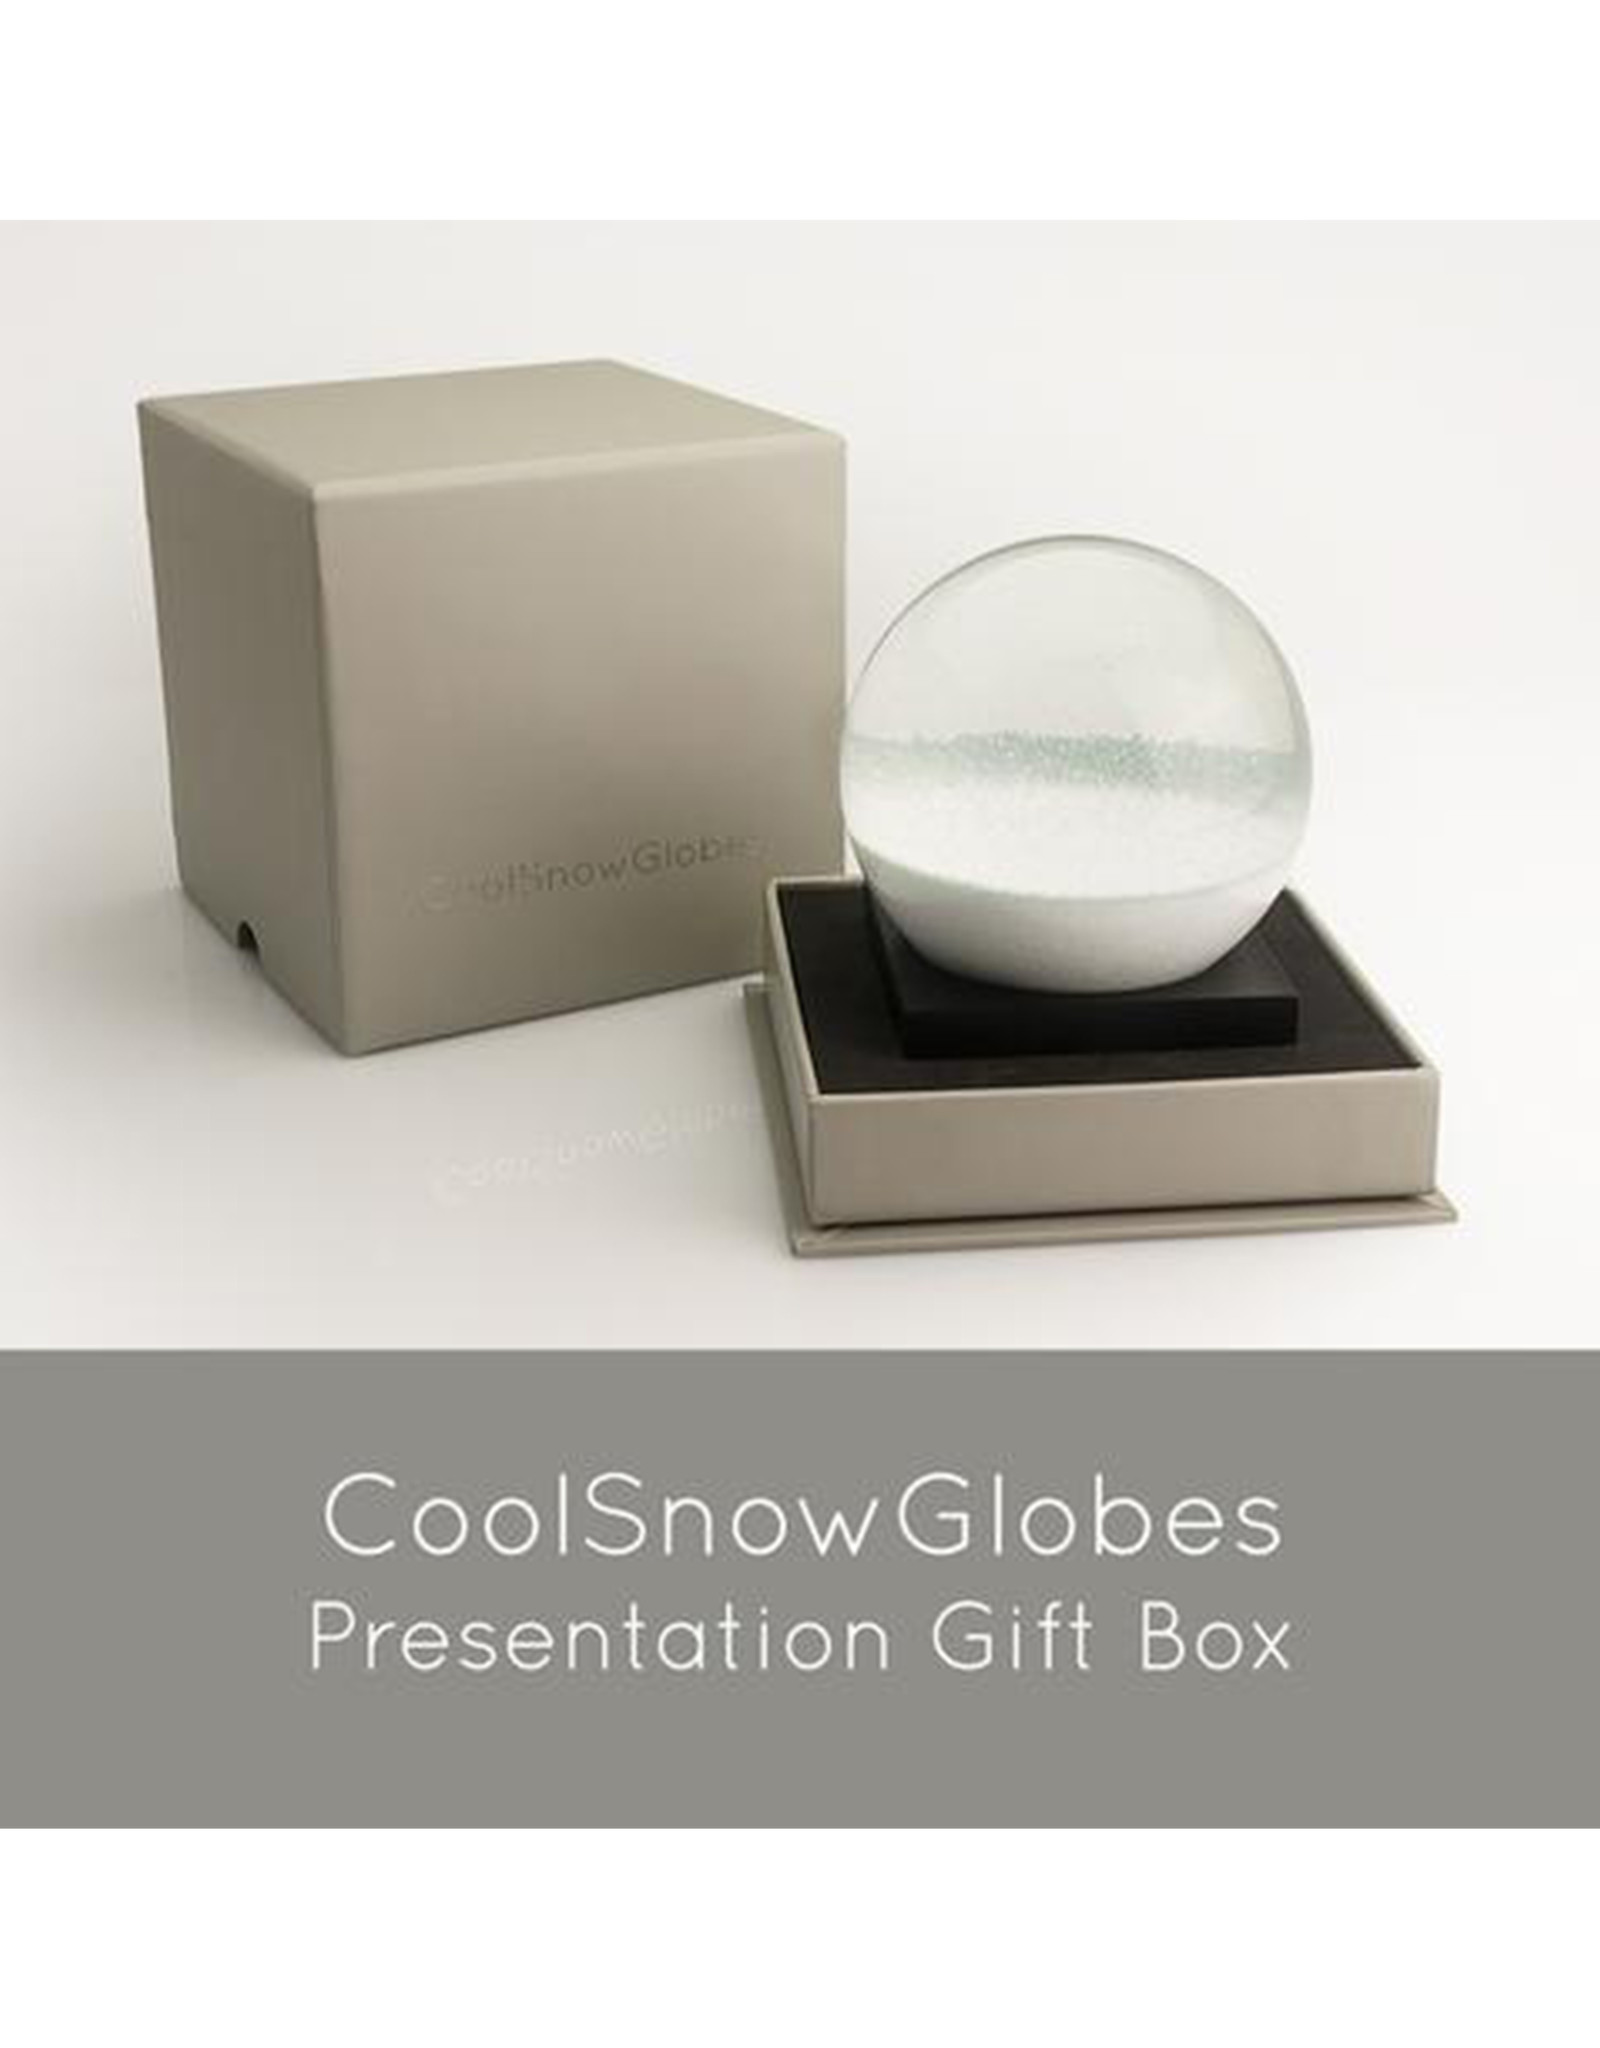 COOL SNOW GLOBES THREE DANCERS SNOW GLOBE